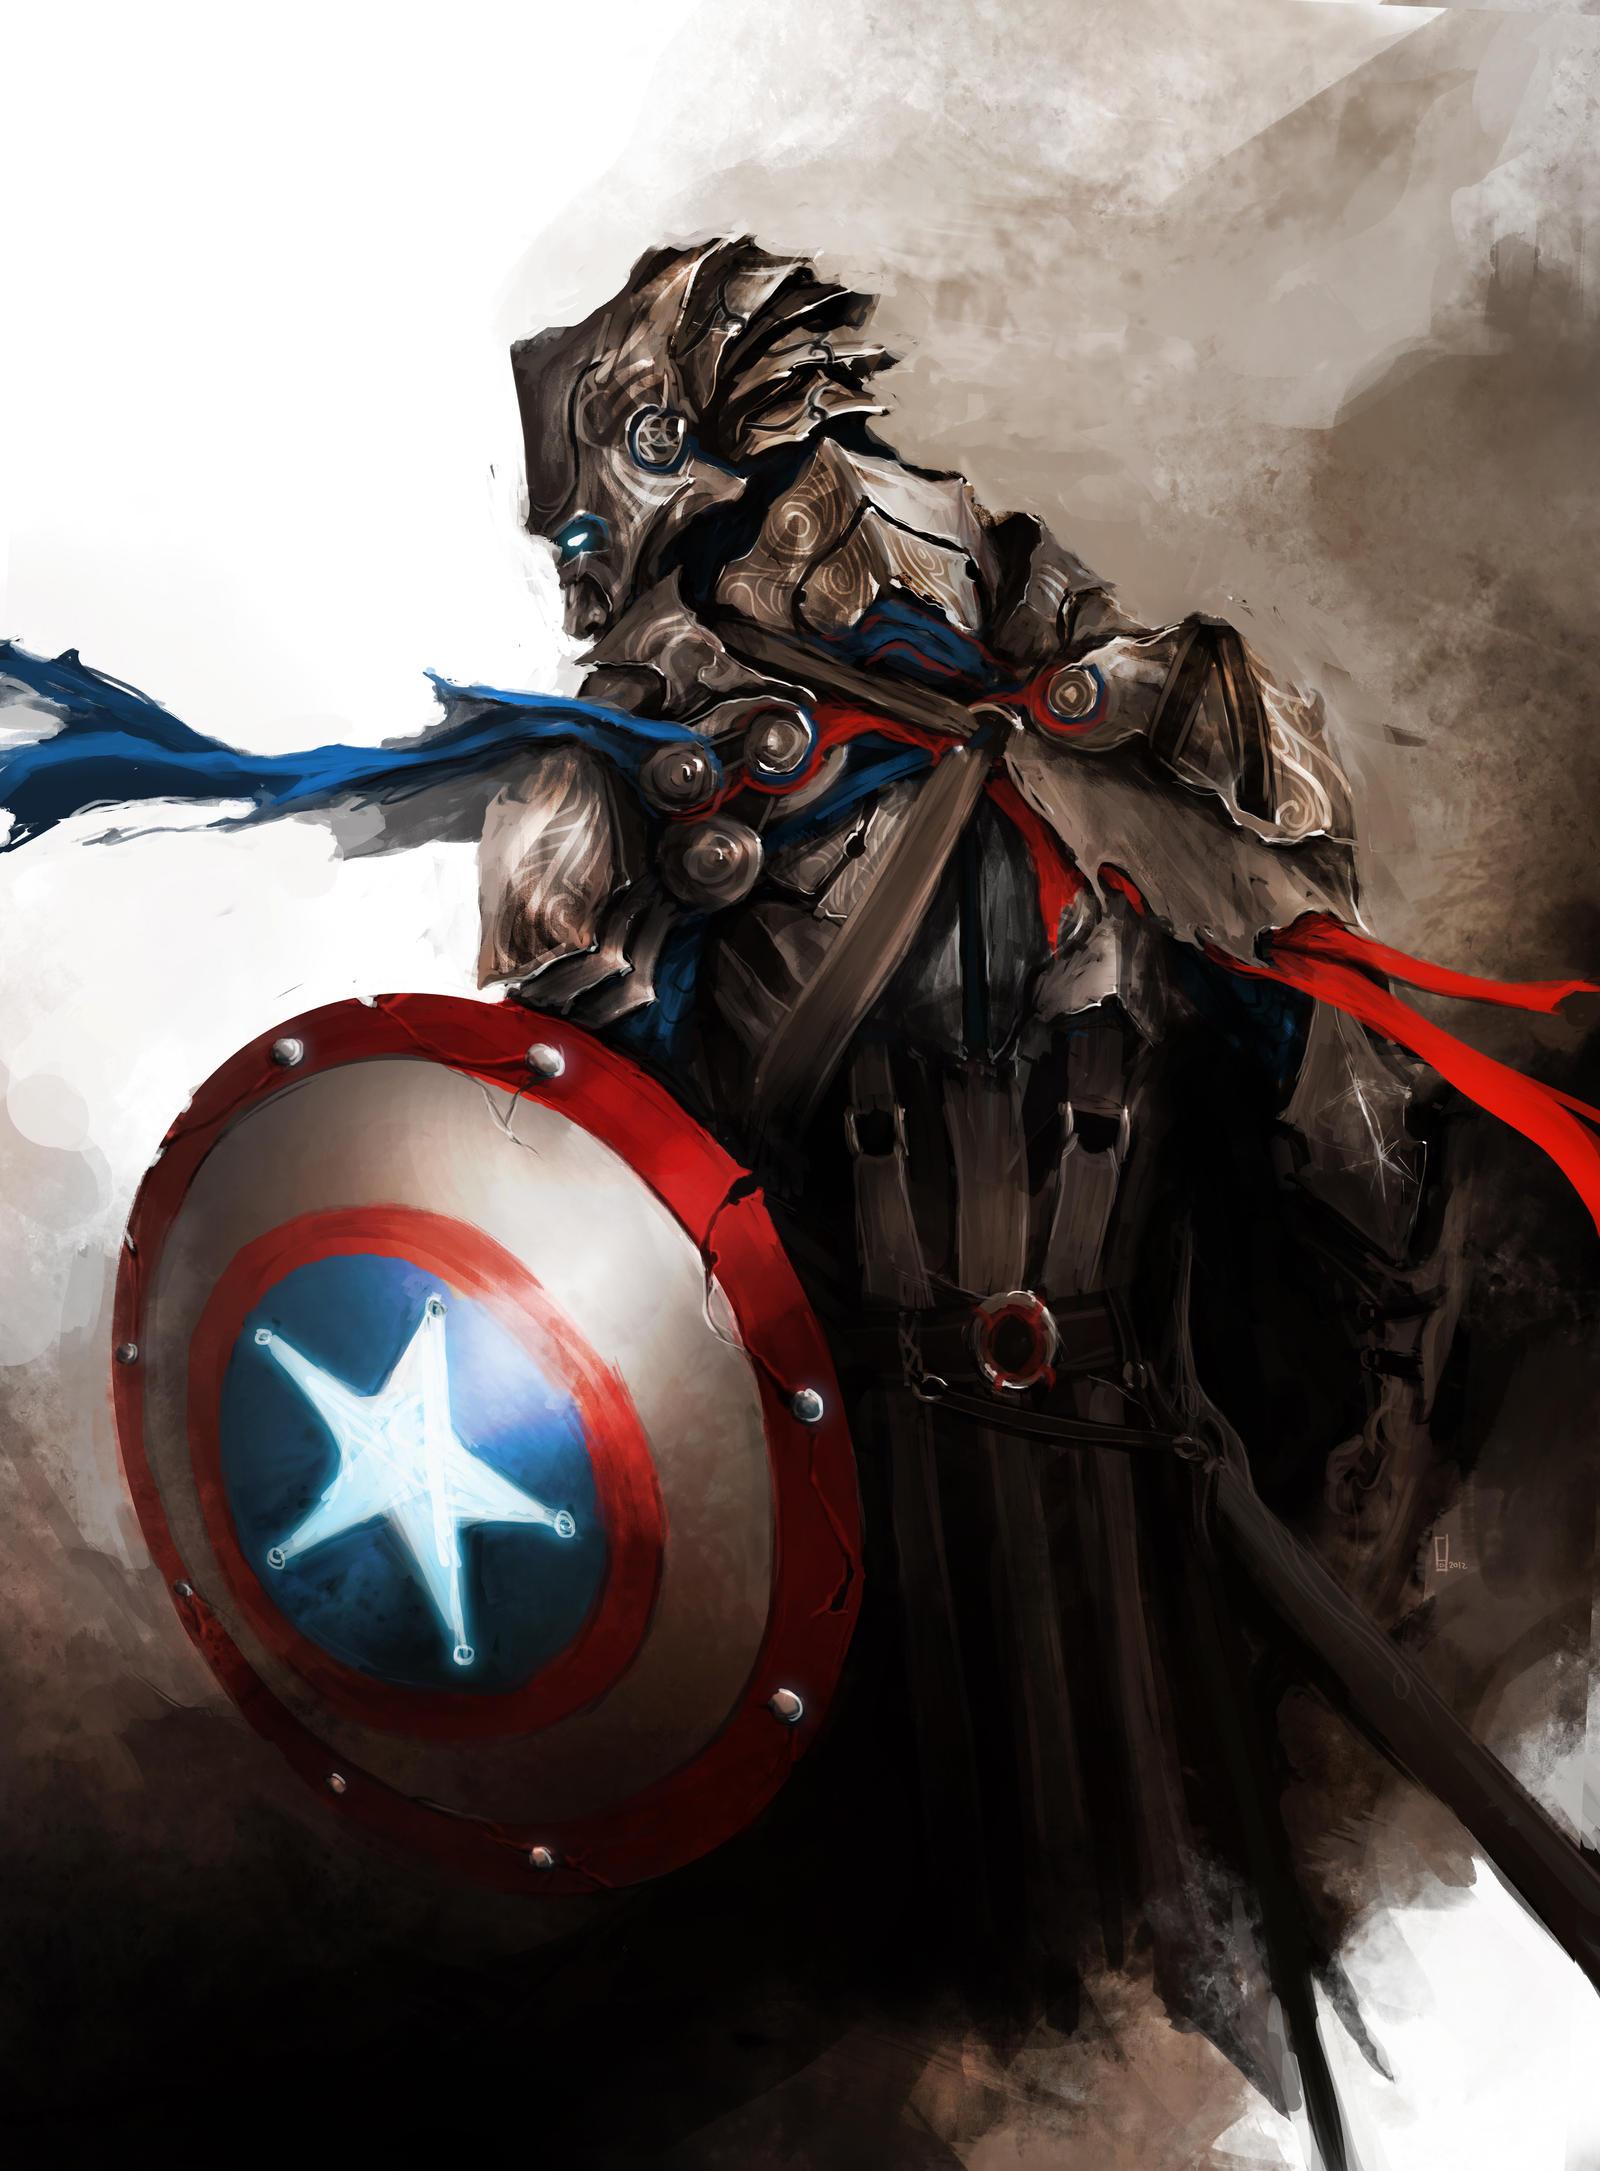 Képek - Page 3 The_avengers___captain_america_by_thedurrrrian-d53ch2c